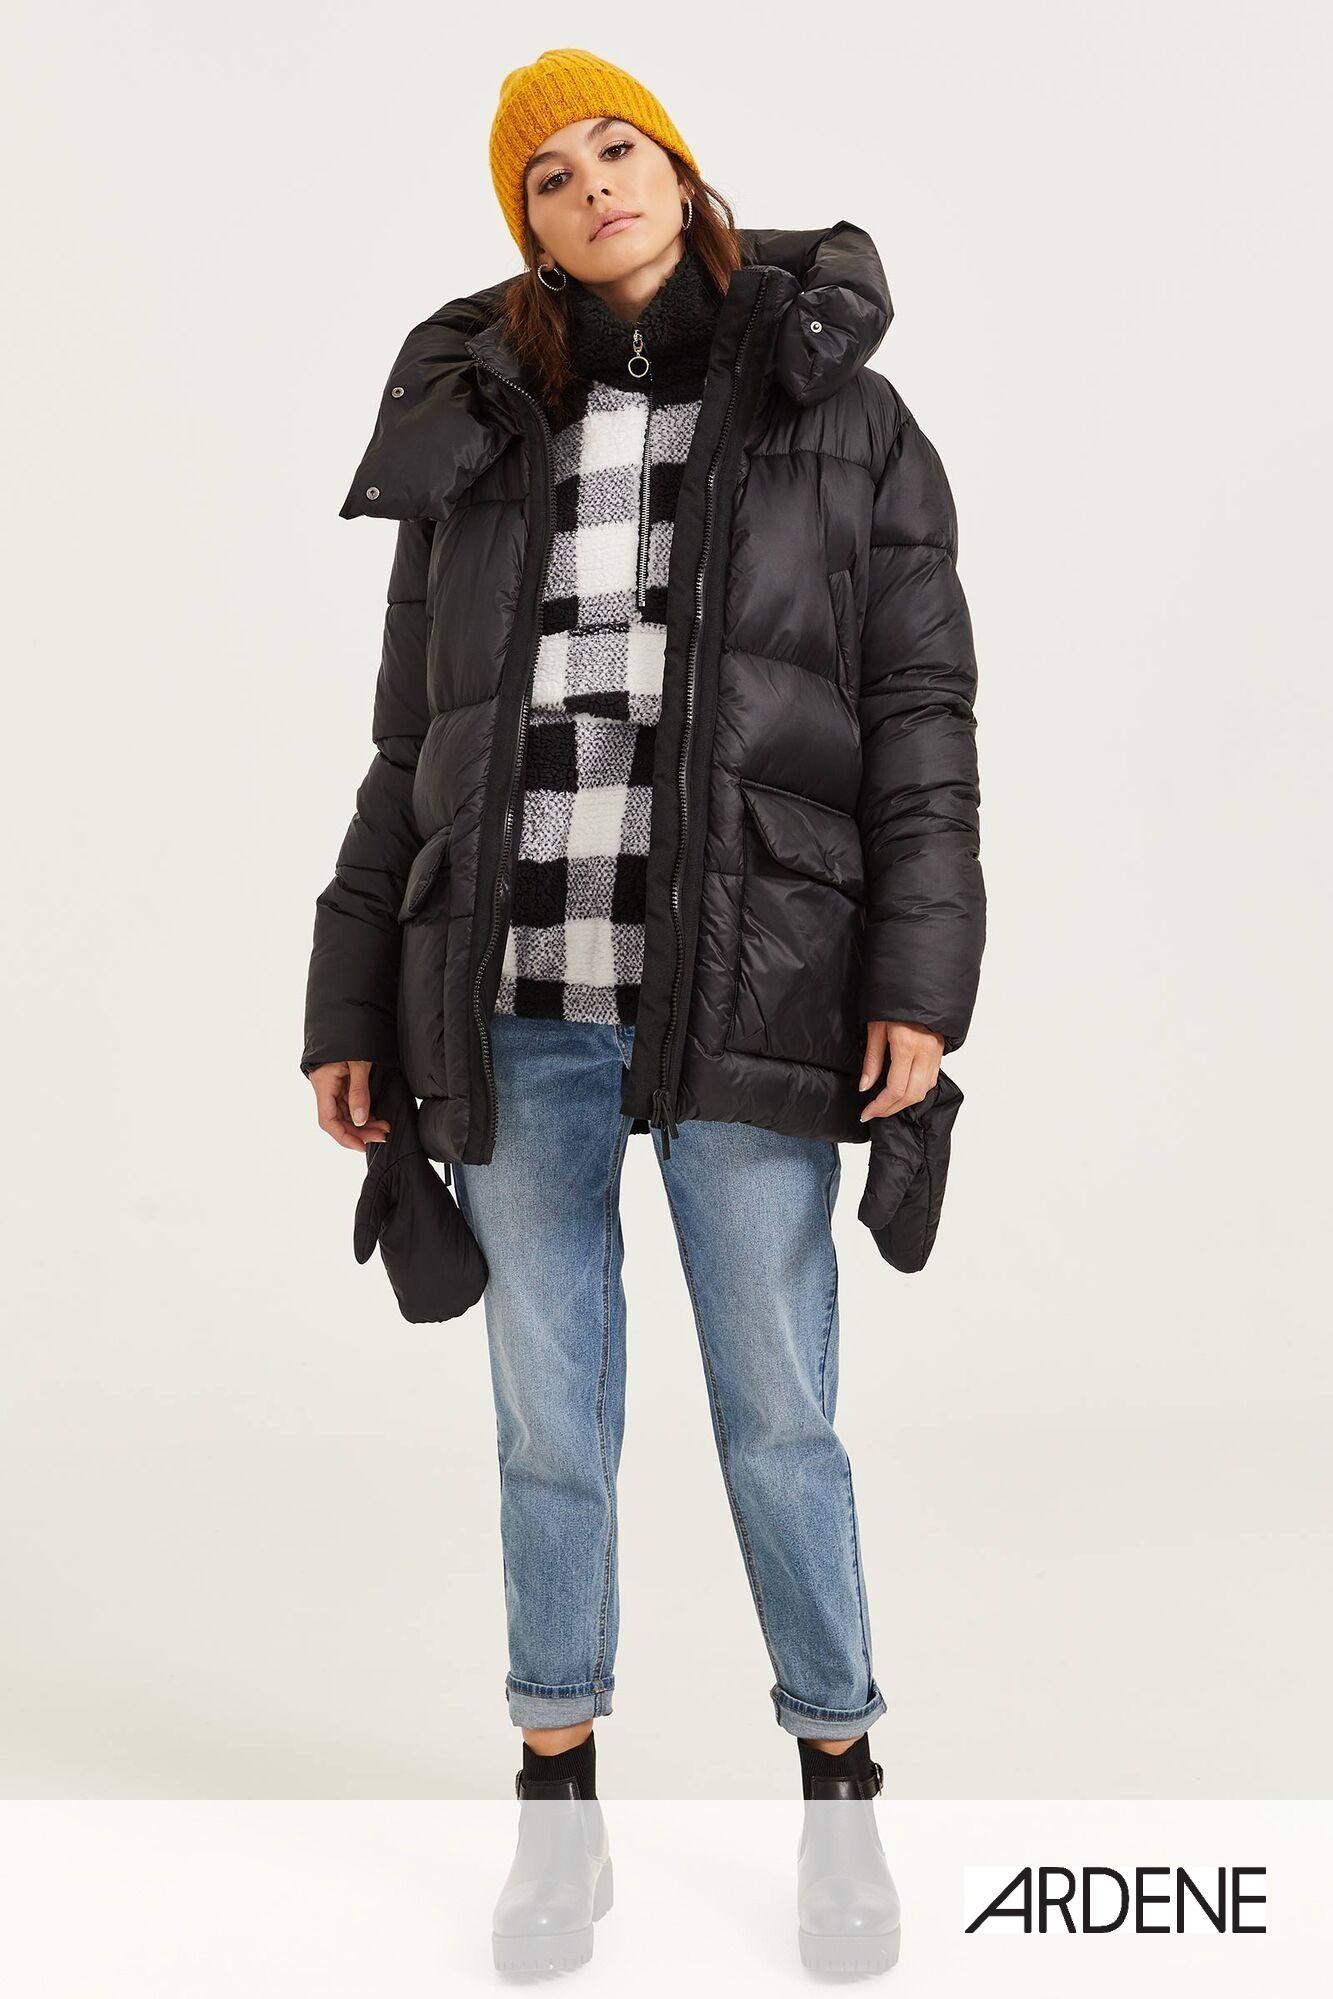 Oversized Puffer Jacket With Mittens Jackets Puffer Jackets Ardene [ 1999 x 1333 Pixel ]